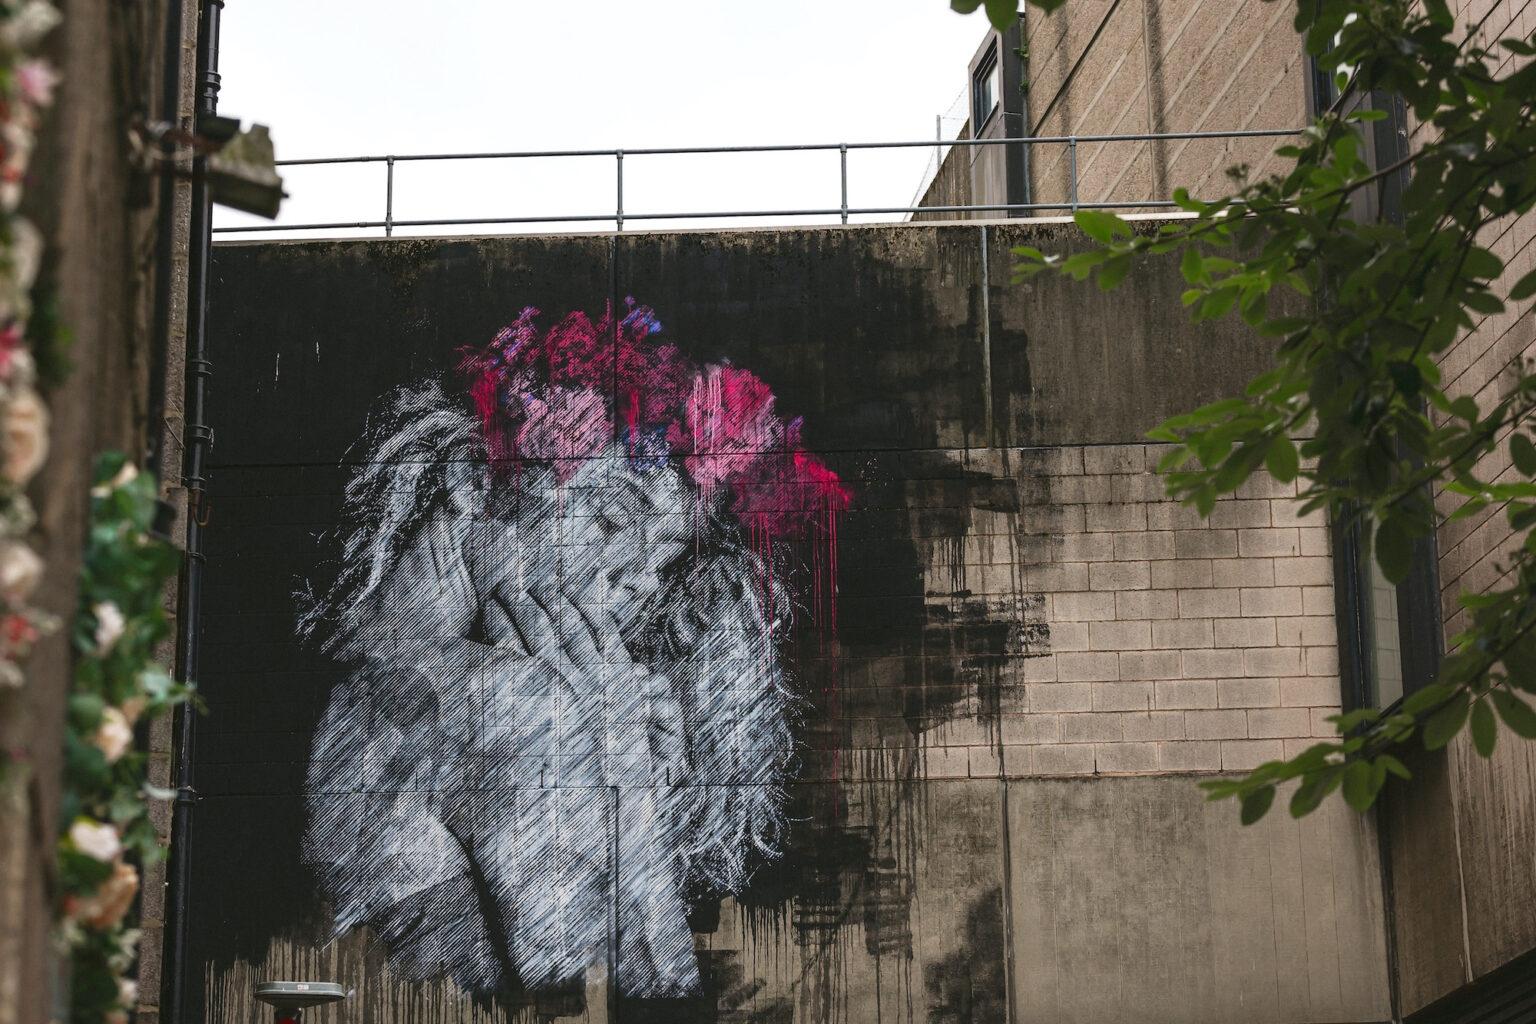 Mural by SNIK in Aberdeen, Scotland